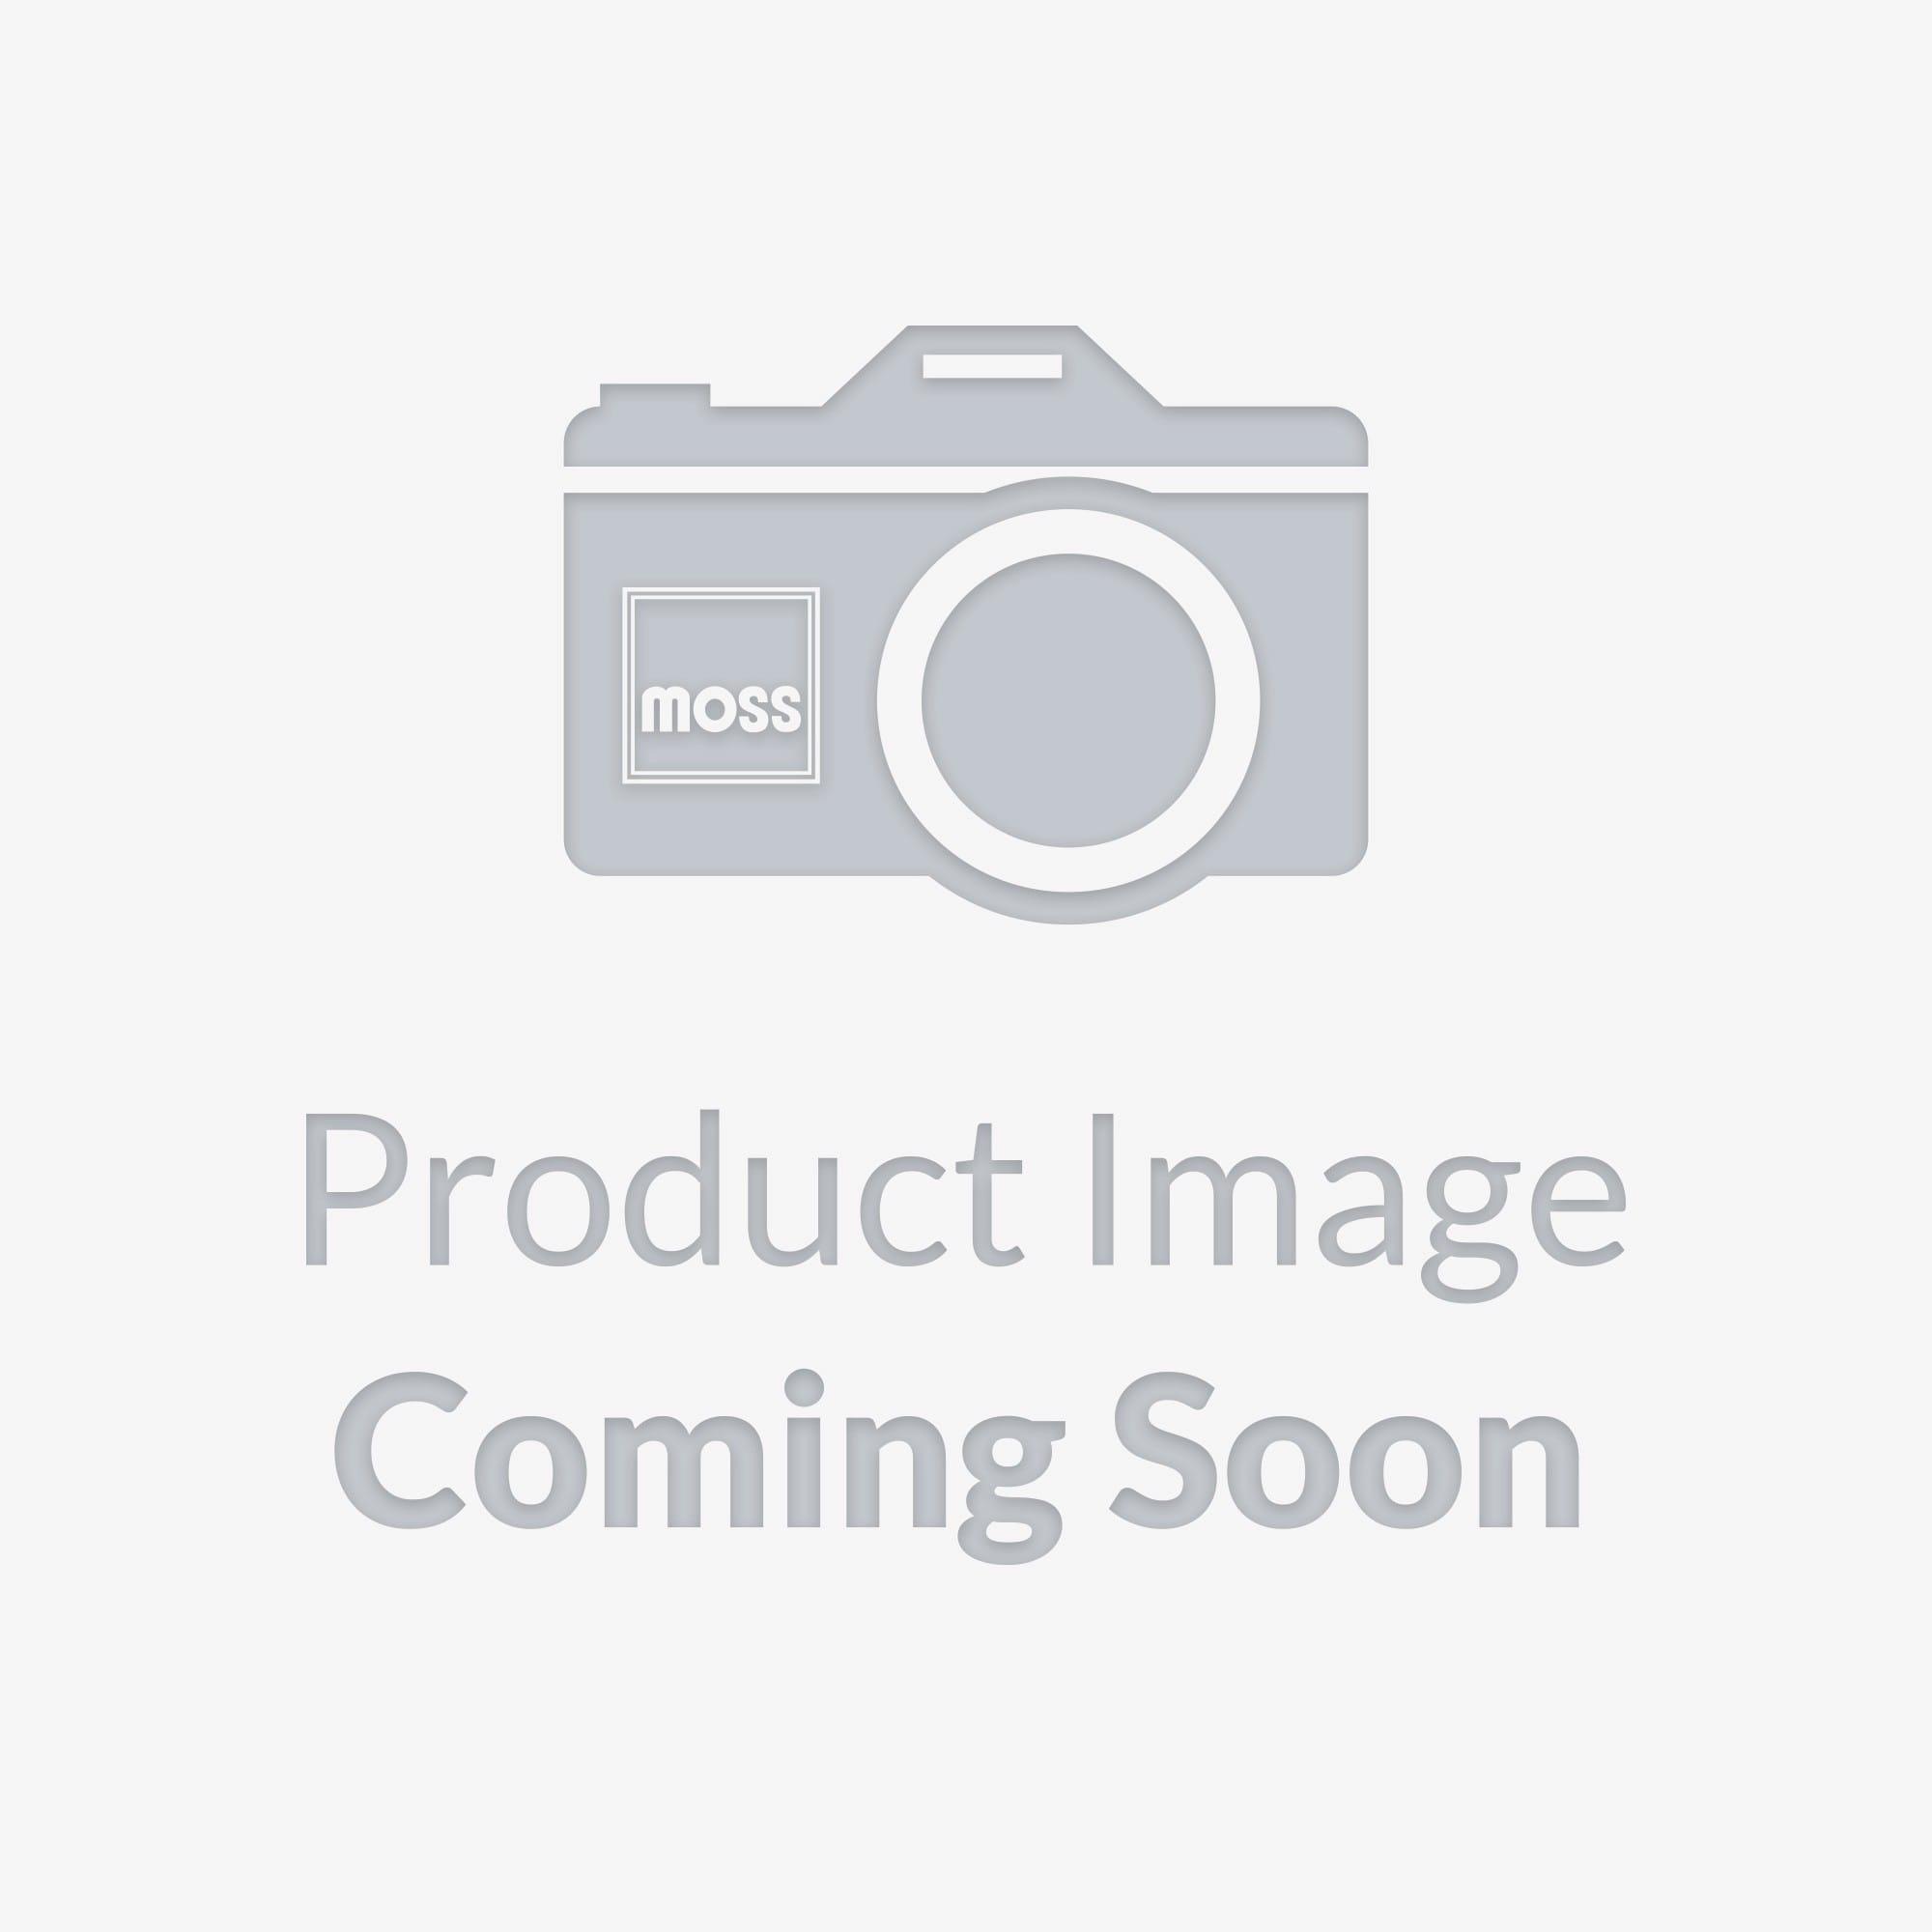 366-380 Mikuni Carburetor Conversion Kit   Moss Motors